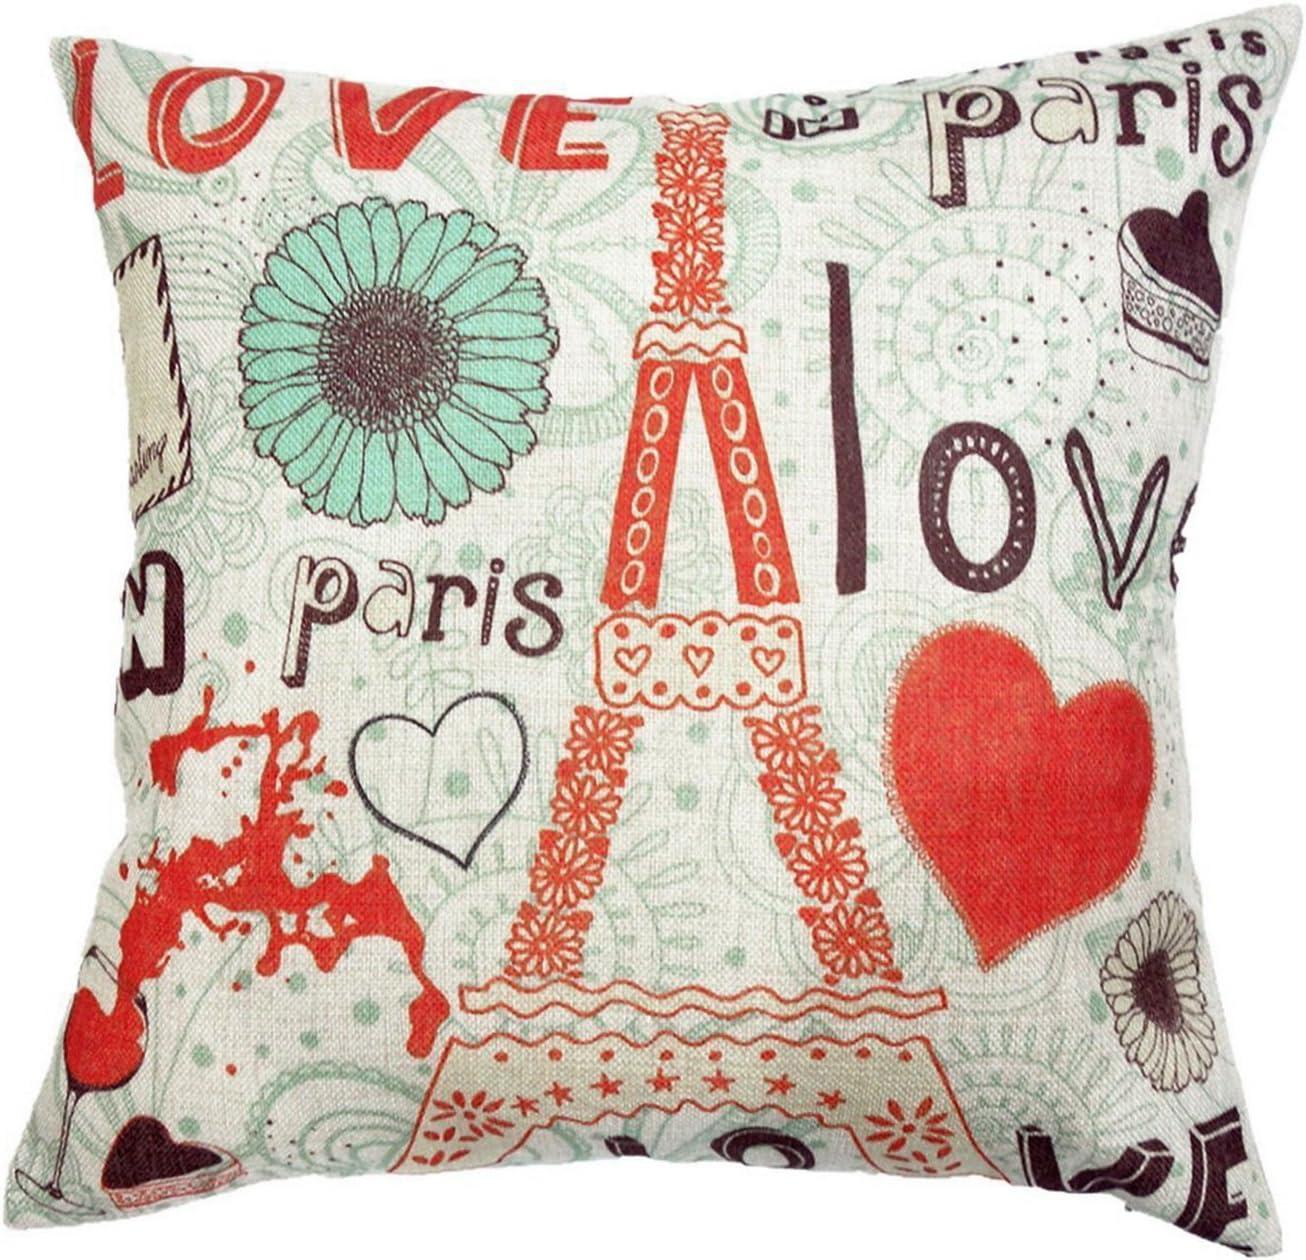 Decor MI Colourful Love Paris Pattern Cotton Square Throw Pillow Case Decorative Durable Cushion Slipcover Home Decor Standard Size Pillowcase Slip Cover 18x18 Inch